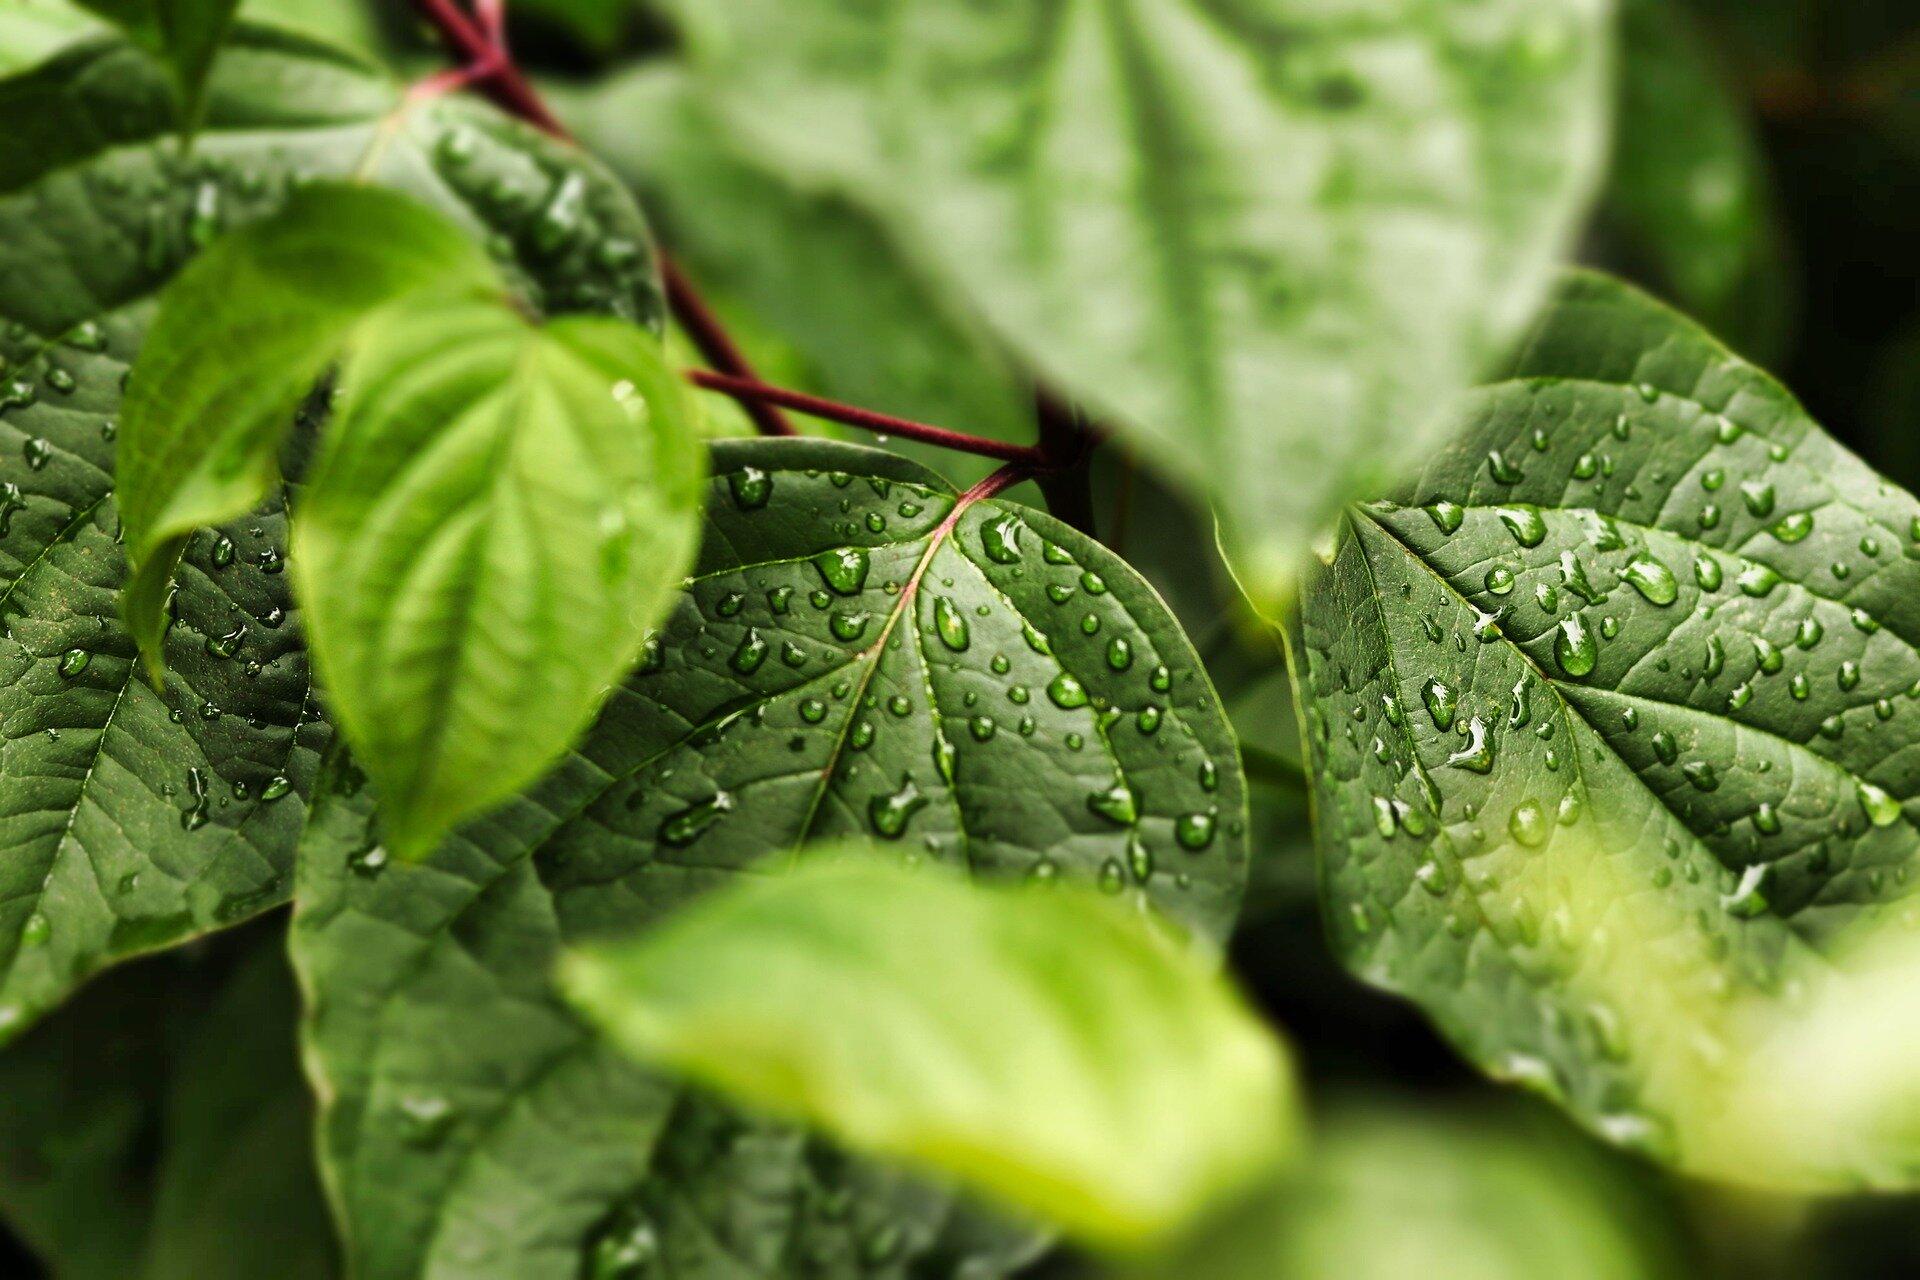 Plant water saving system works like clockwork, it transpires